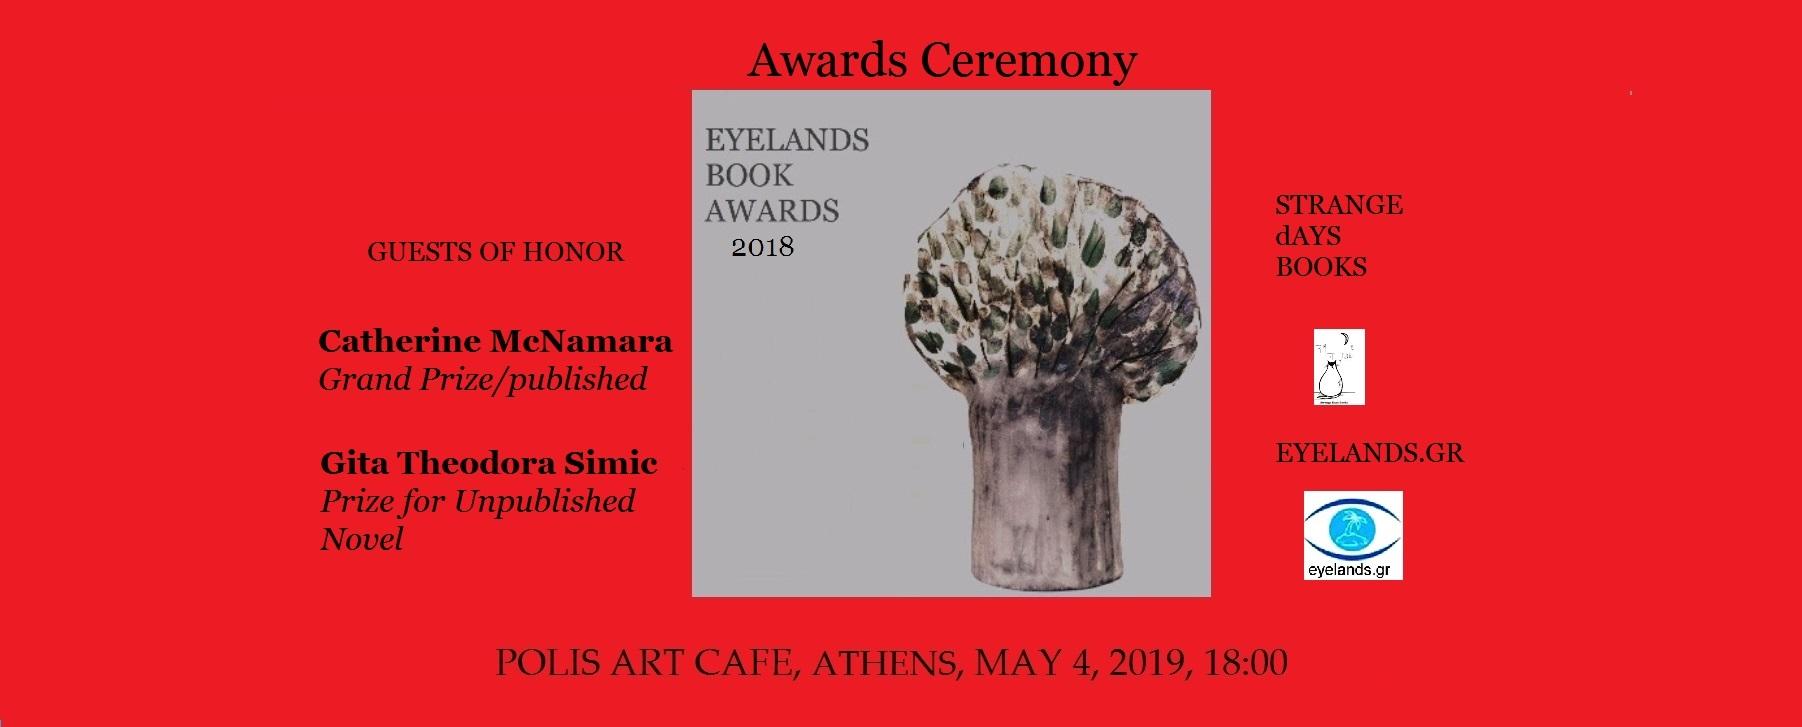 Eyelands Book Awards-ceremony